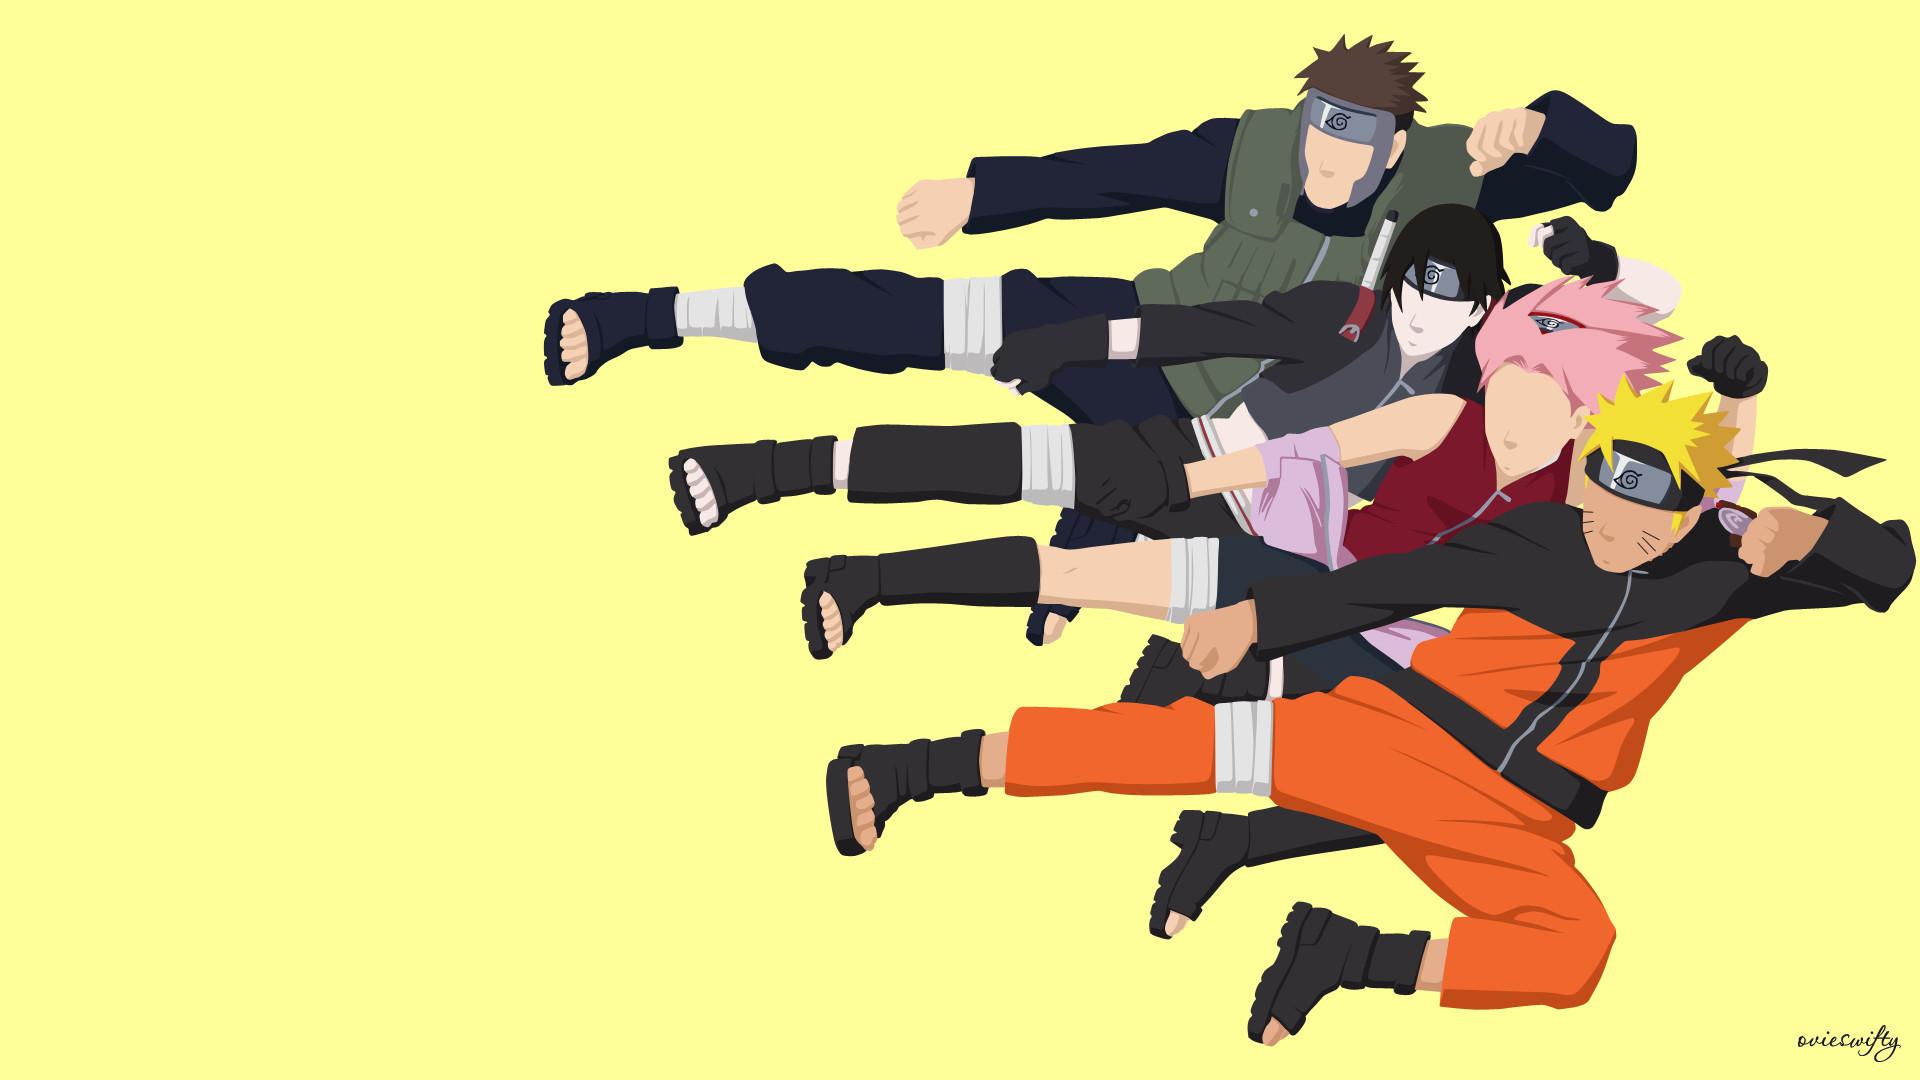 Naruto Team 7 Wallpaper Cute Naruto Team 7 Wallpapers 62 Images